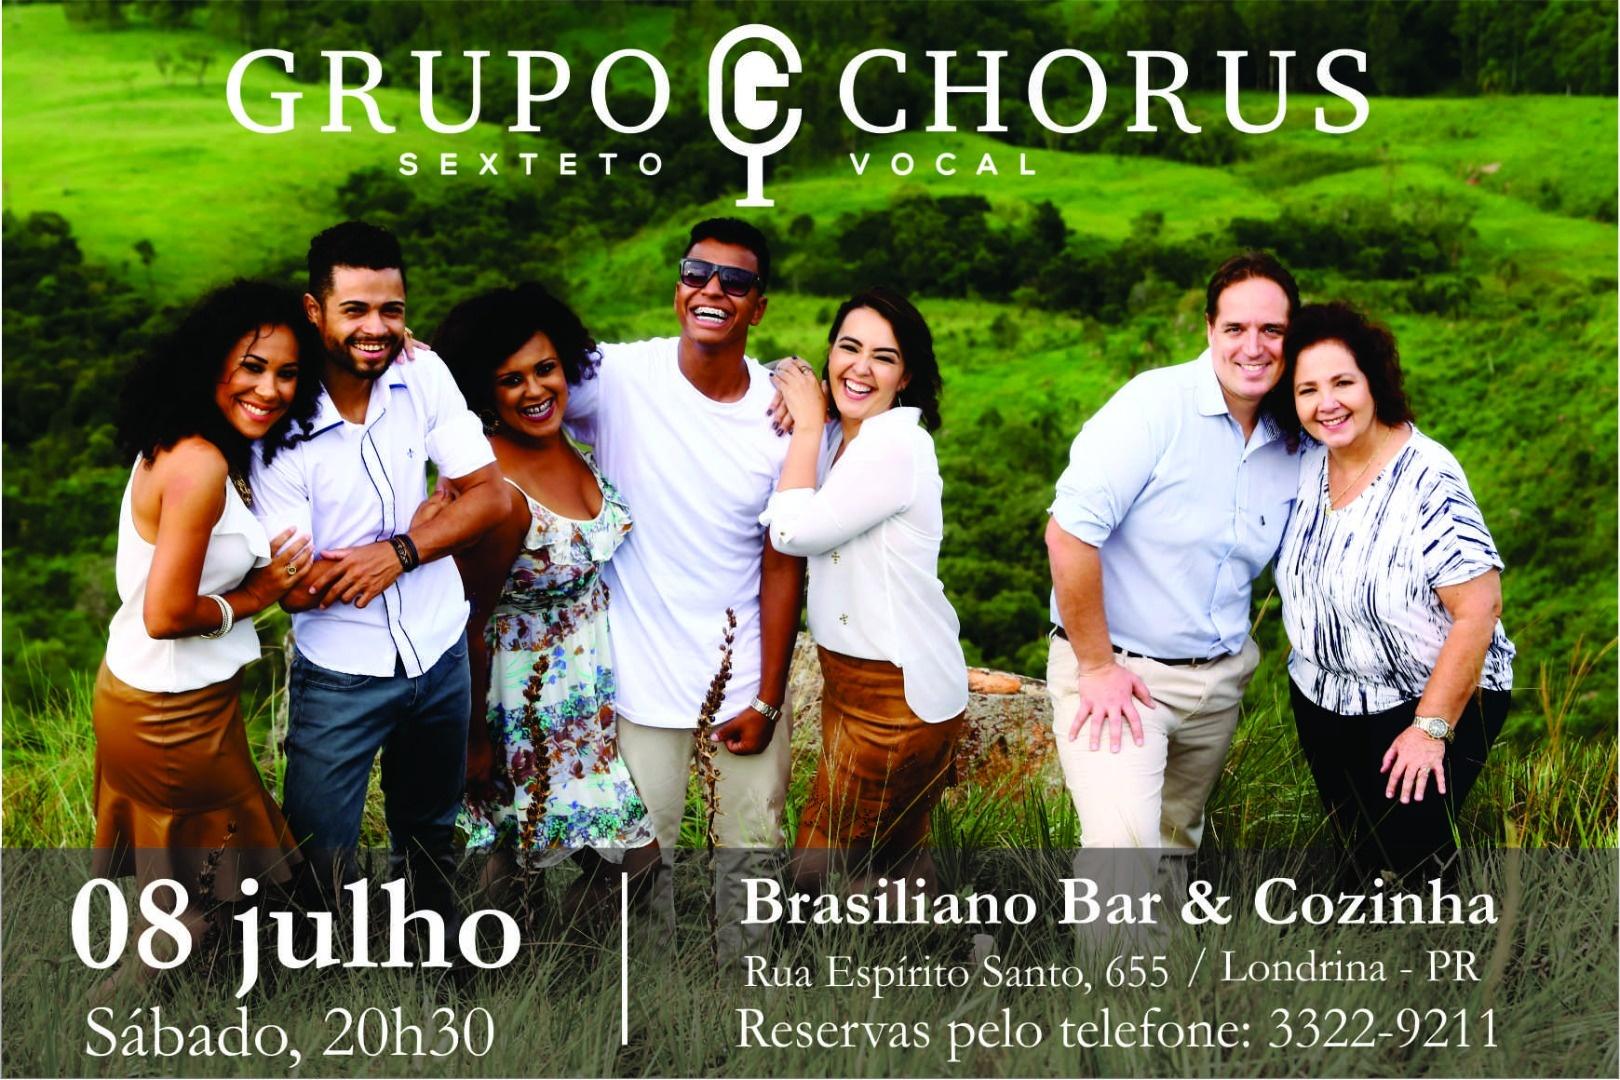 Sábado (08/07) no Brasiliano